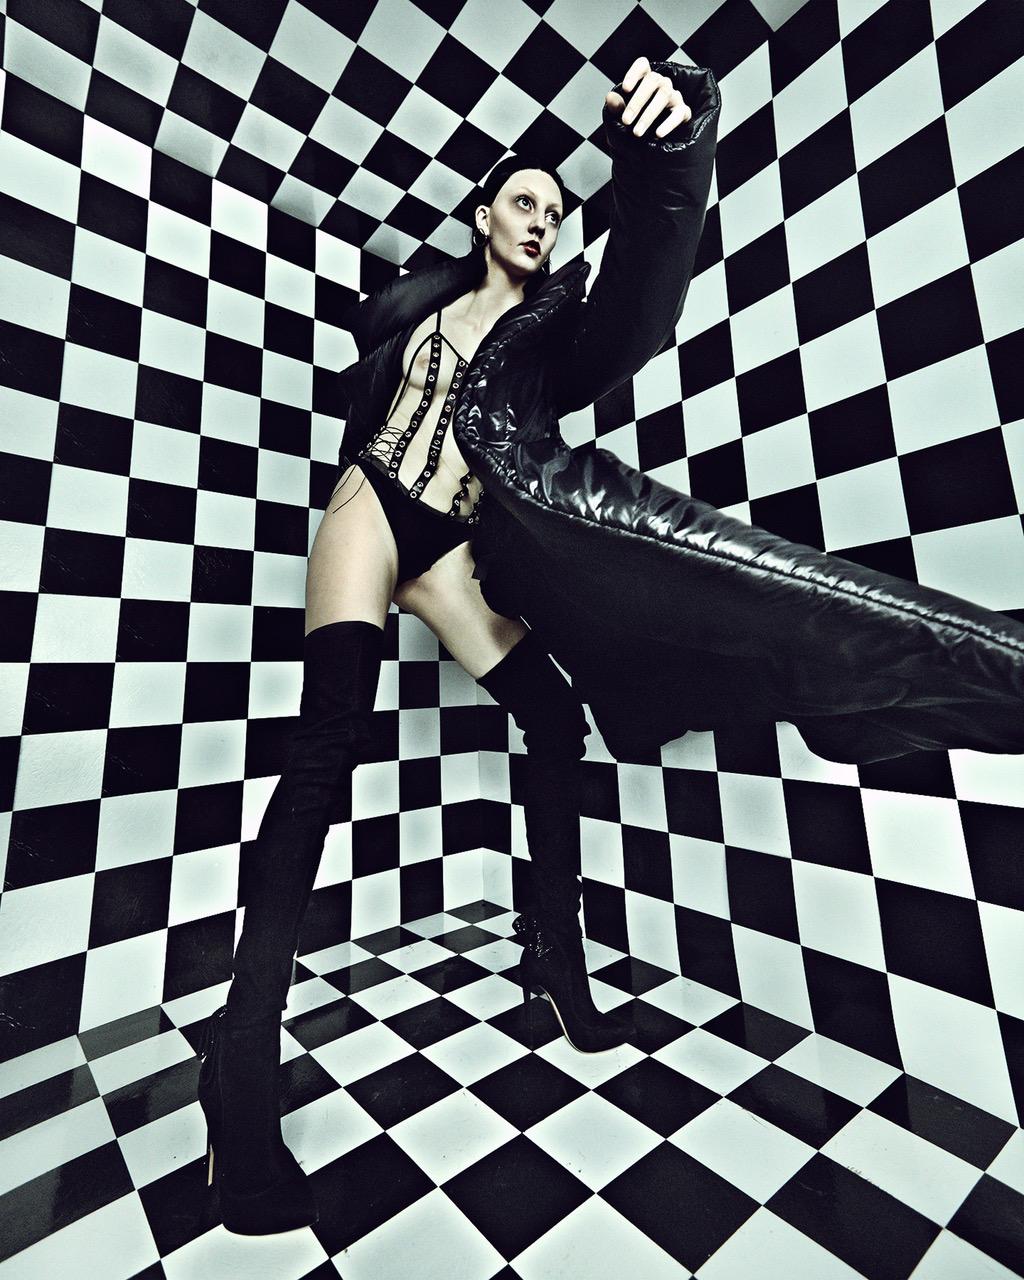 God save Queens bodysuit, Norma Kamali jacket, Aoko Su earrings, boots stylist's own